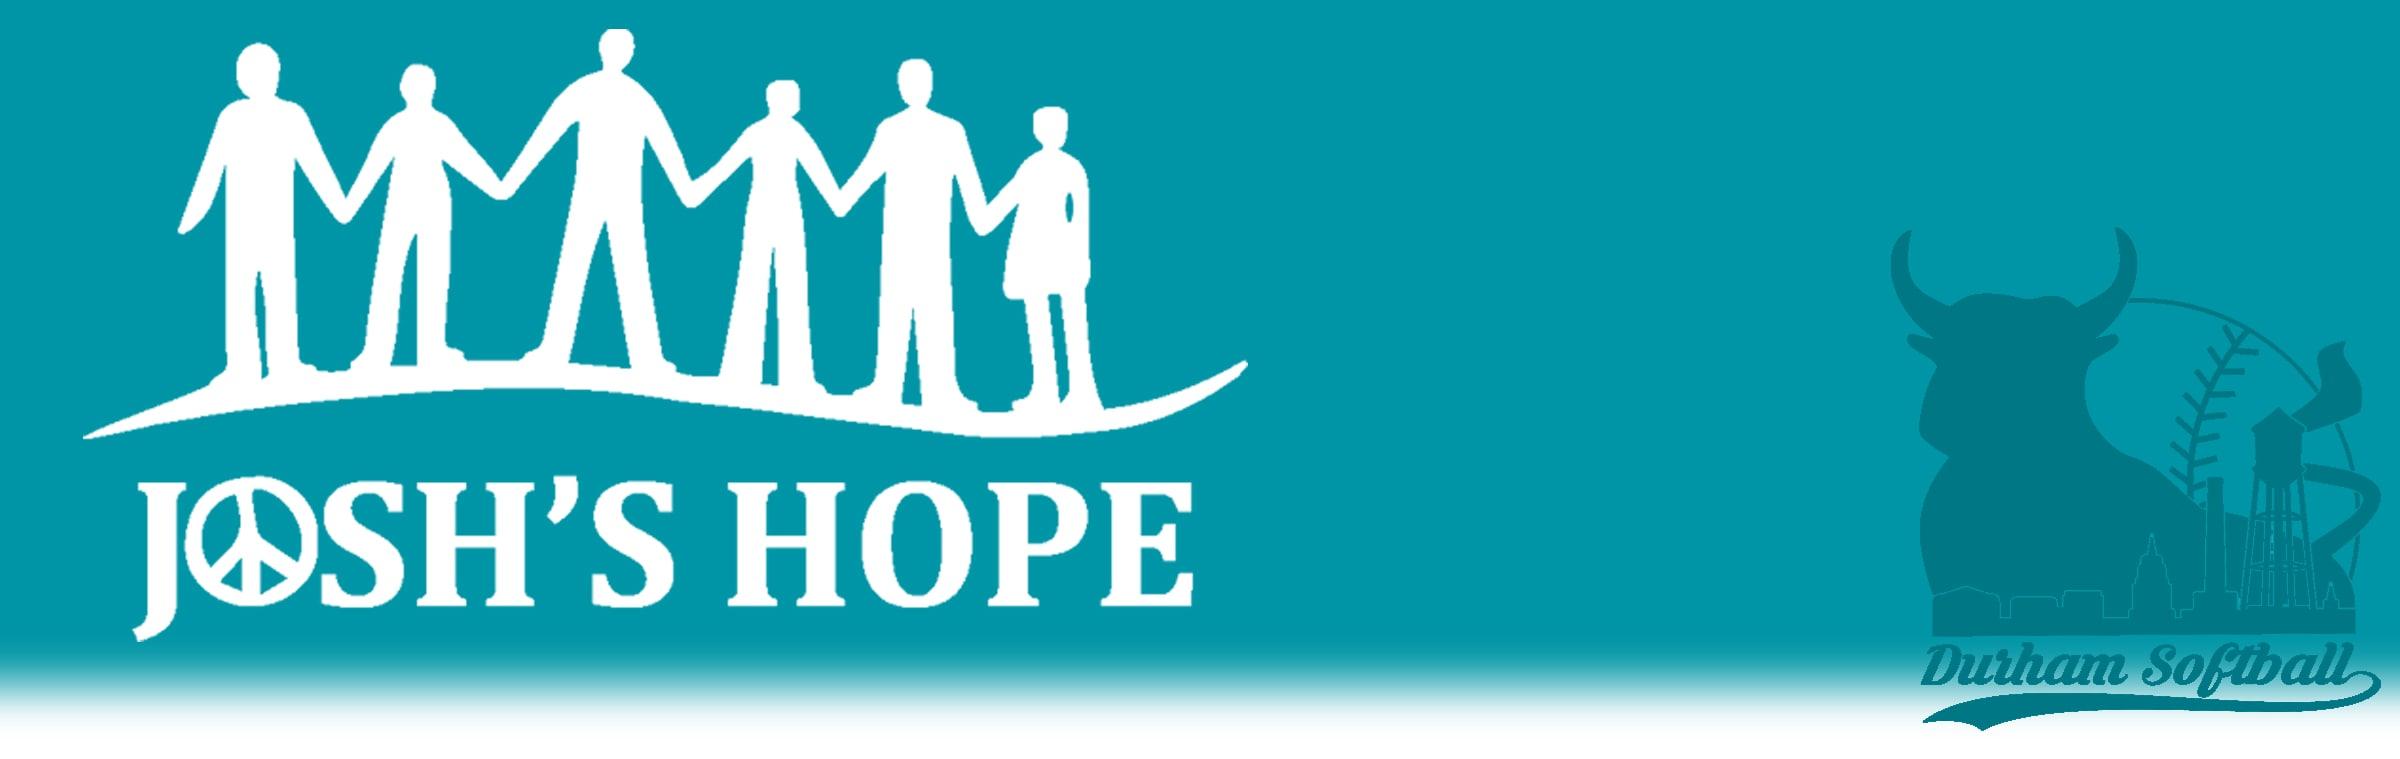 Josh's Hope plays softball for charity.